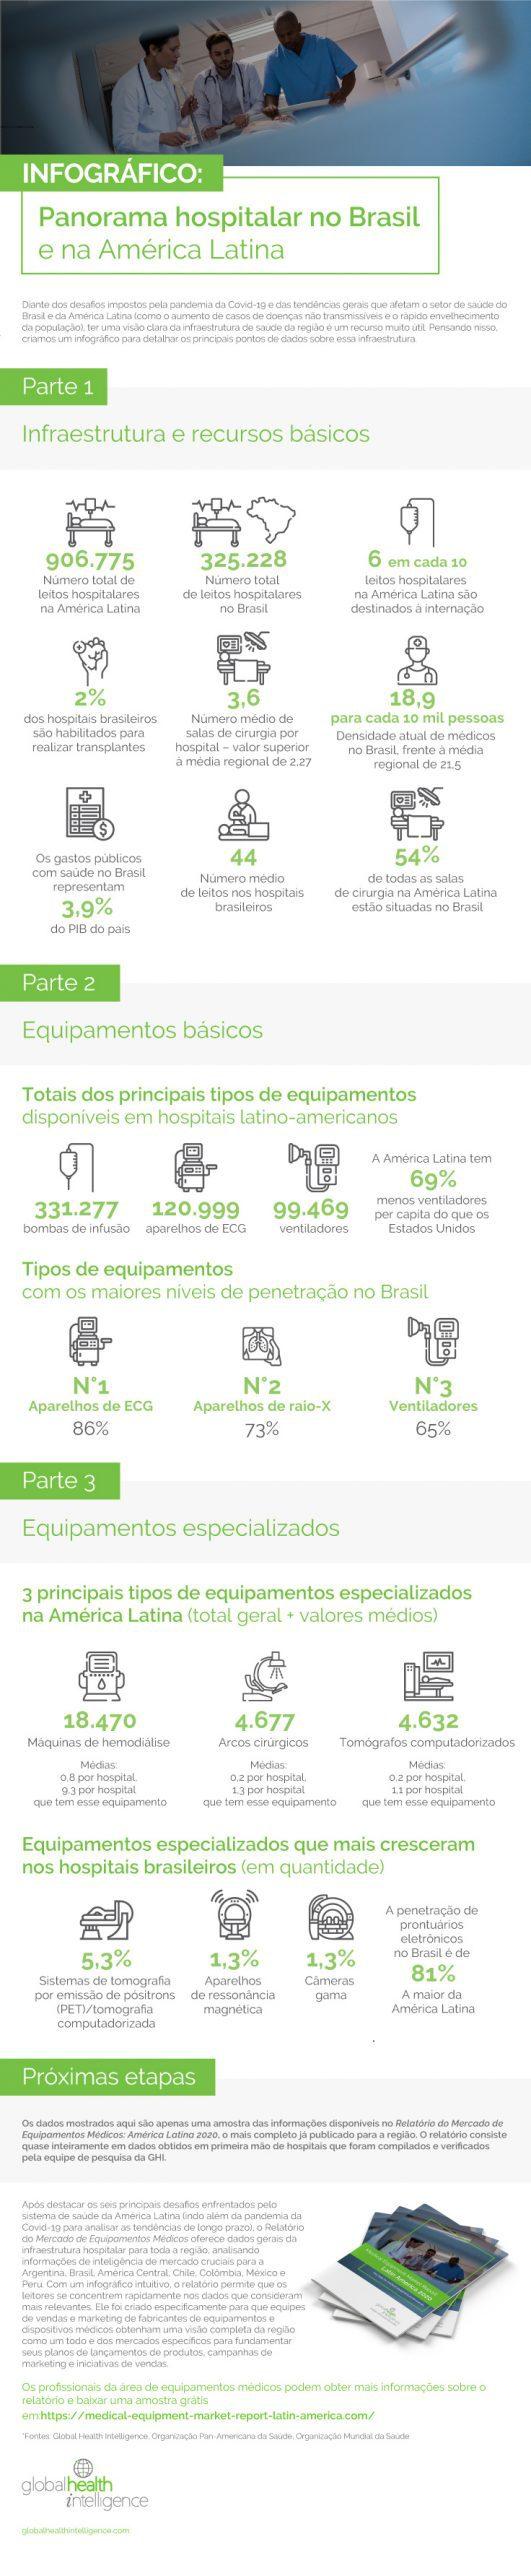 Infográfico: Panorama dos Hospitais Brasileiros e Latino-Americanos